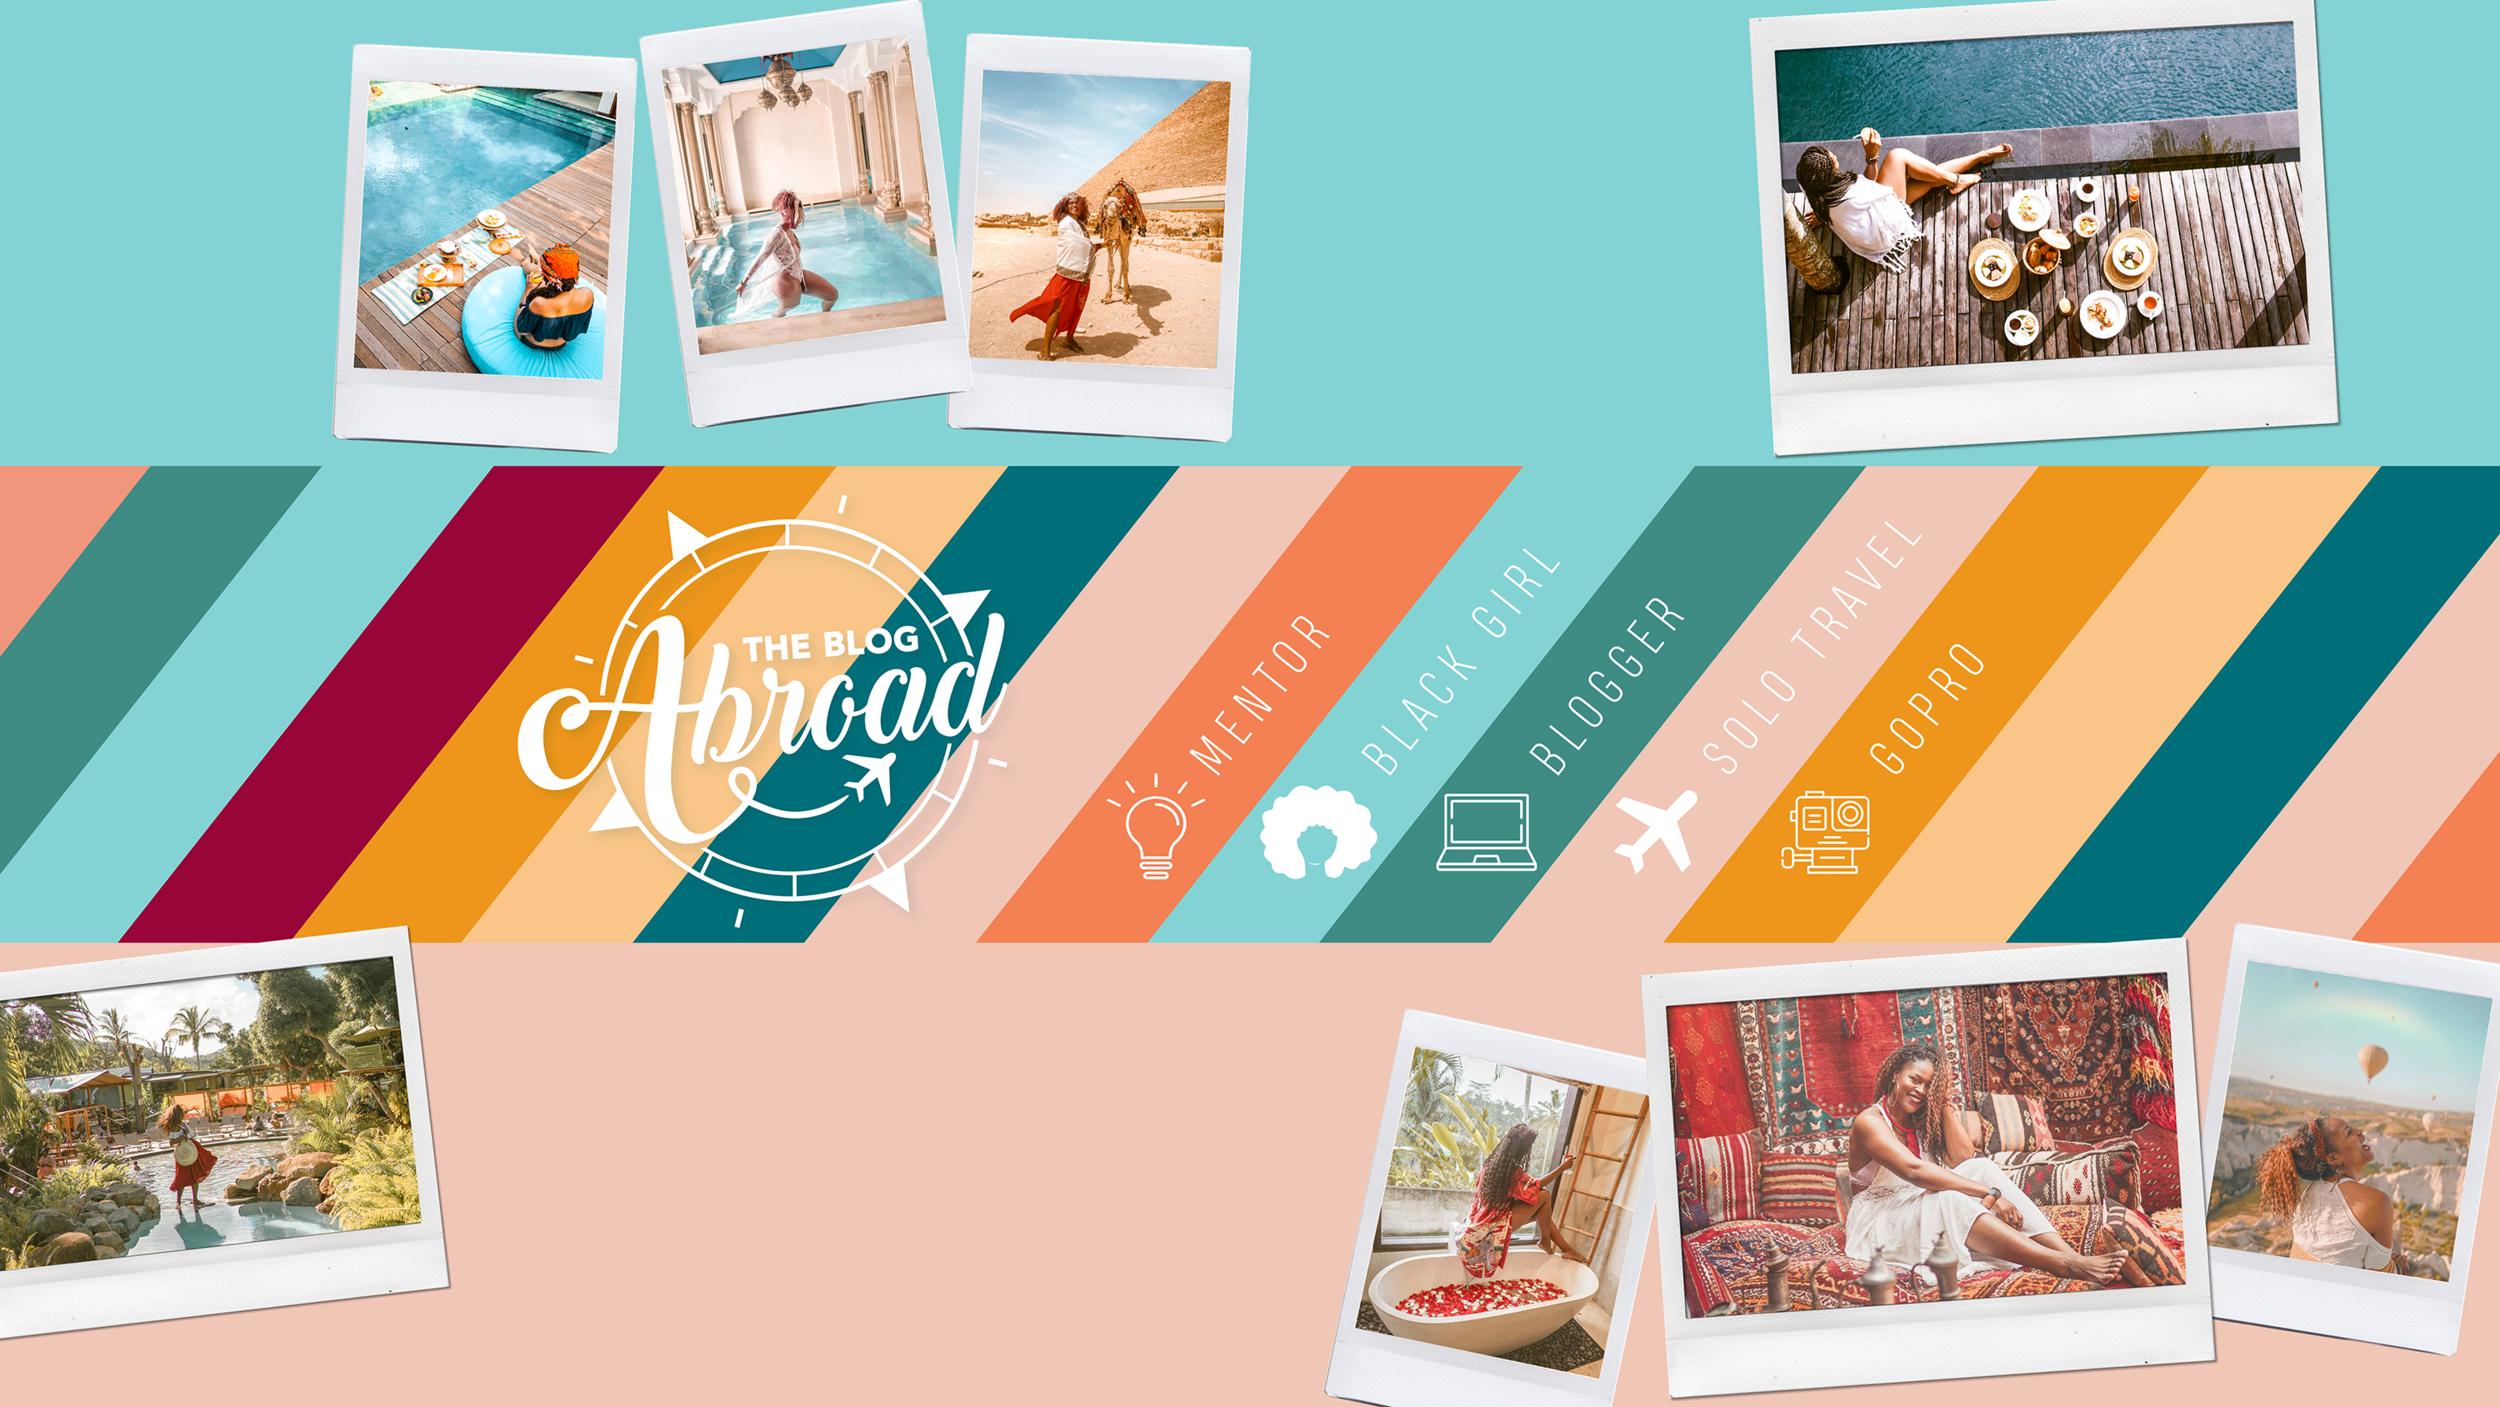 Social Media Banner Images The Blog Abroad